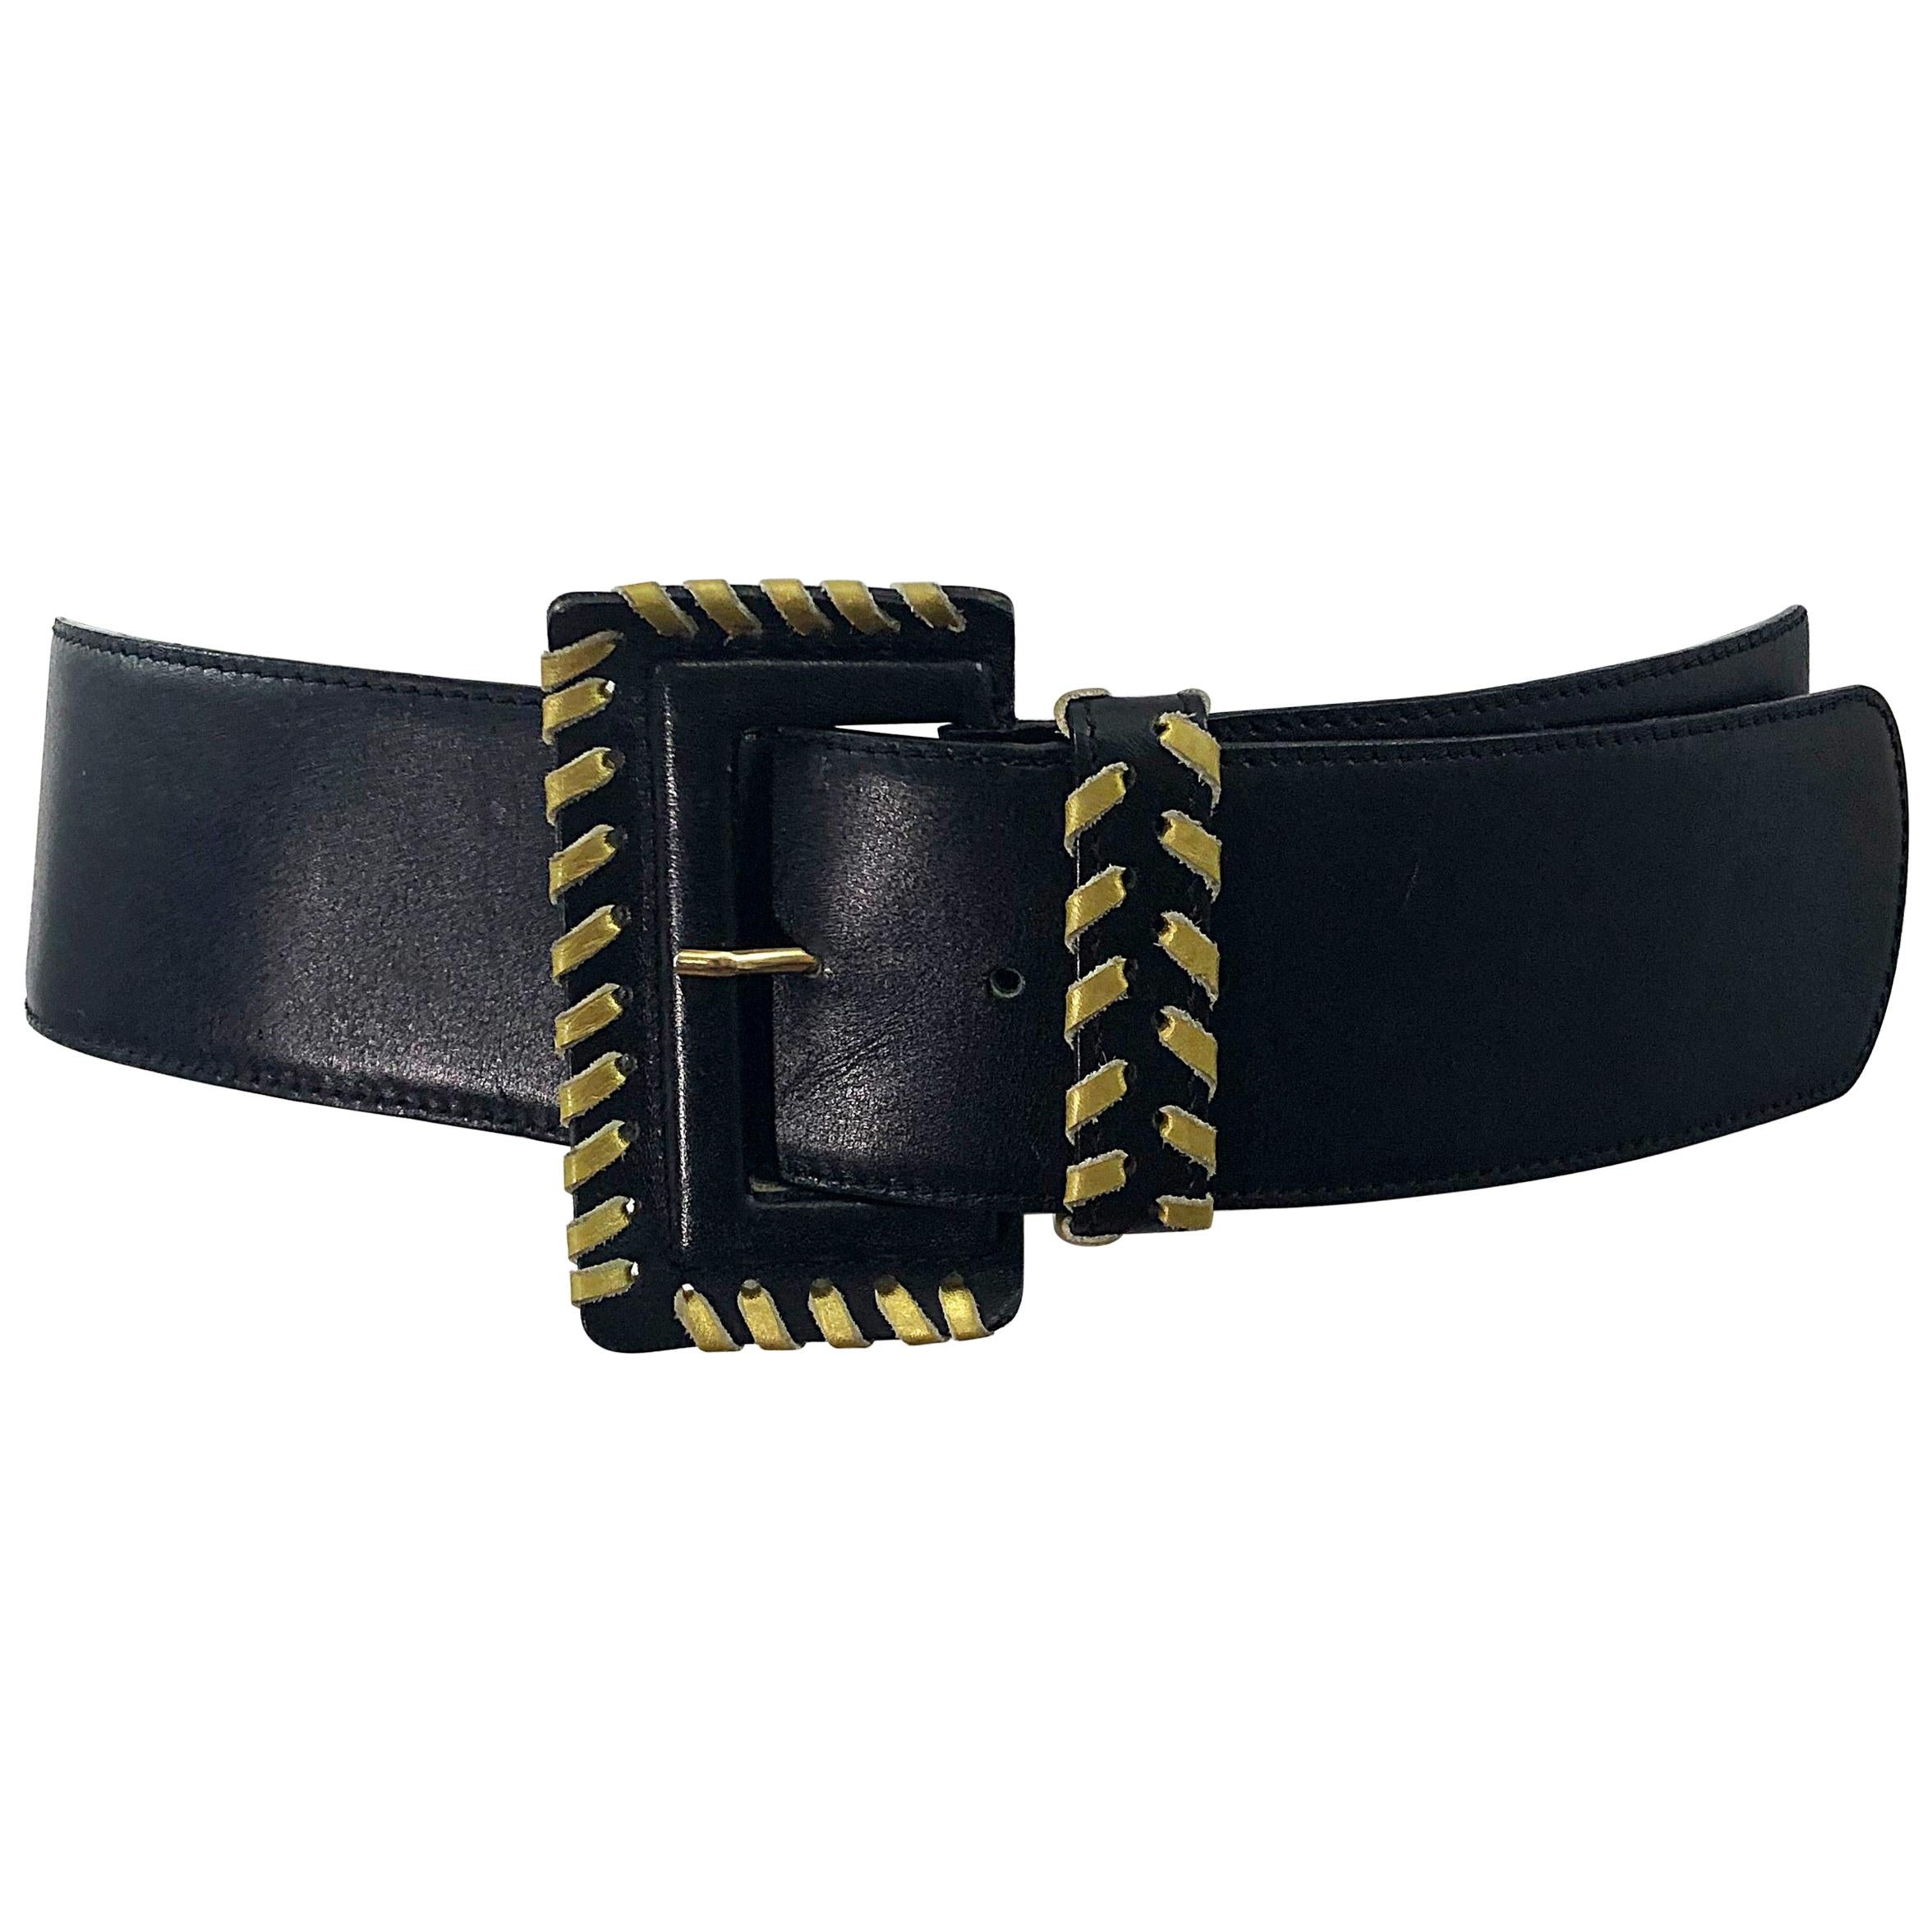 1980s PALOMA PICASSO Gold Tone Signature Brown Lizard Skin Belt